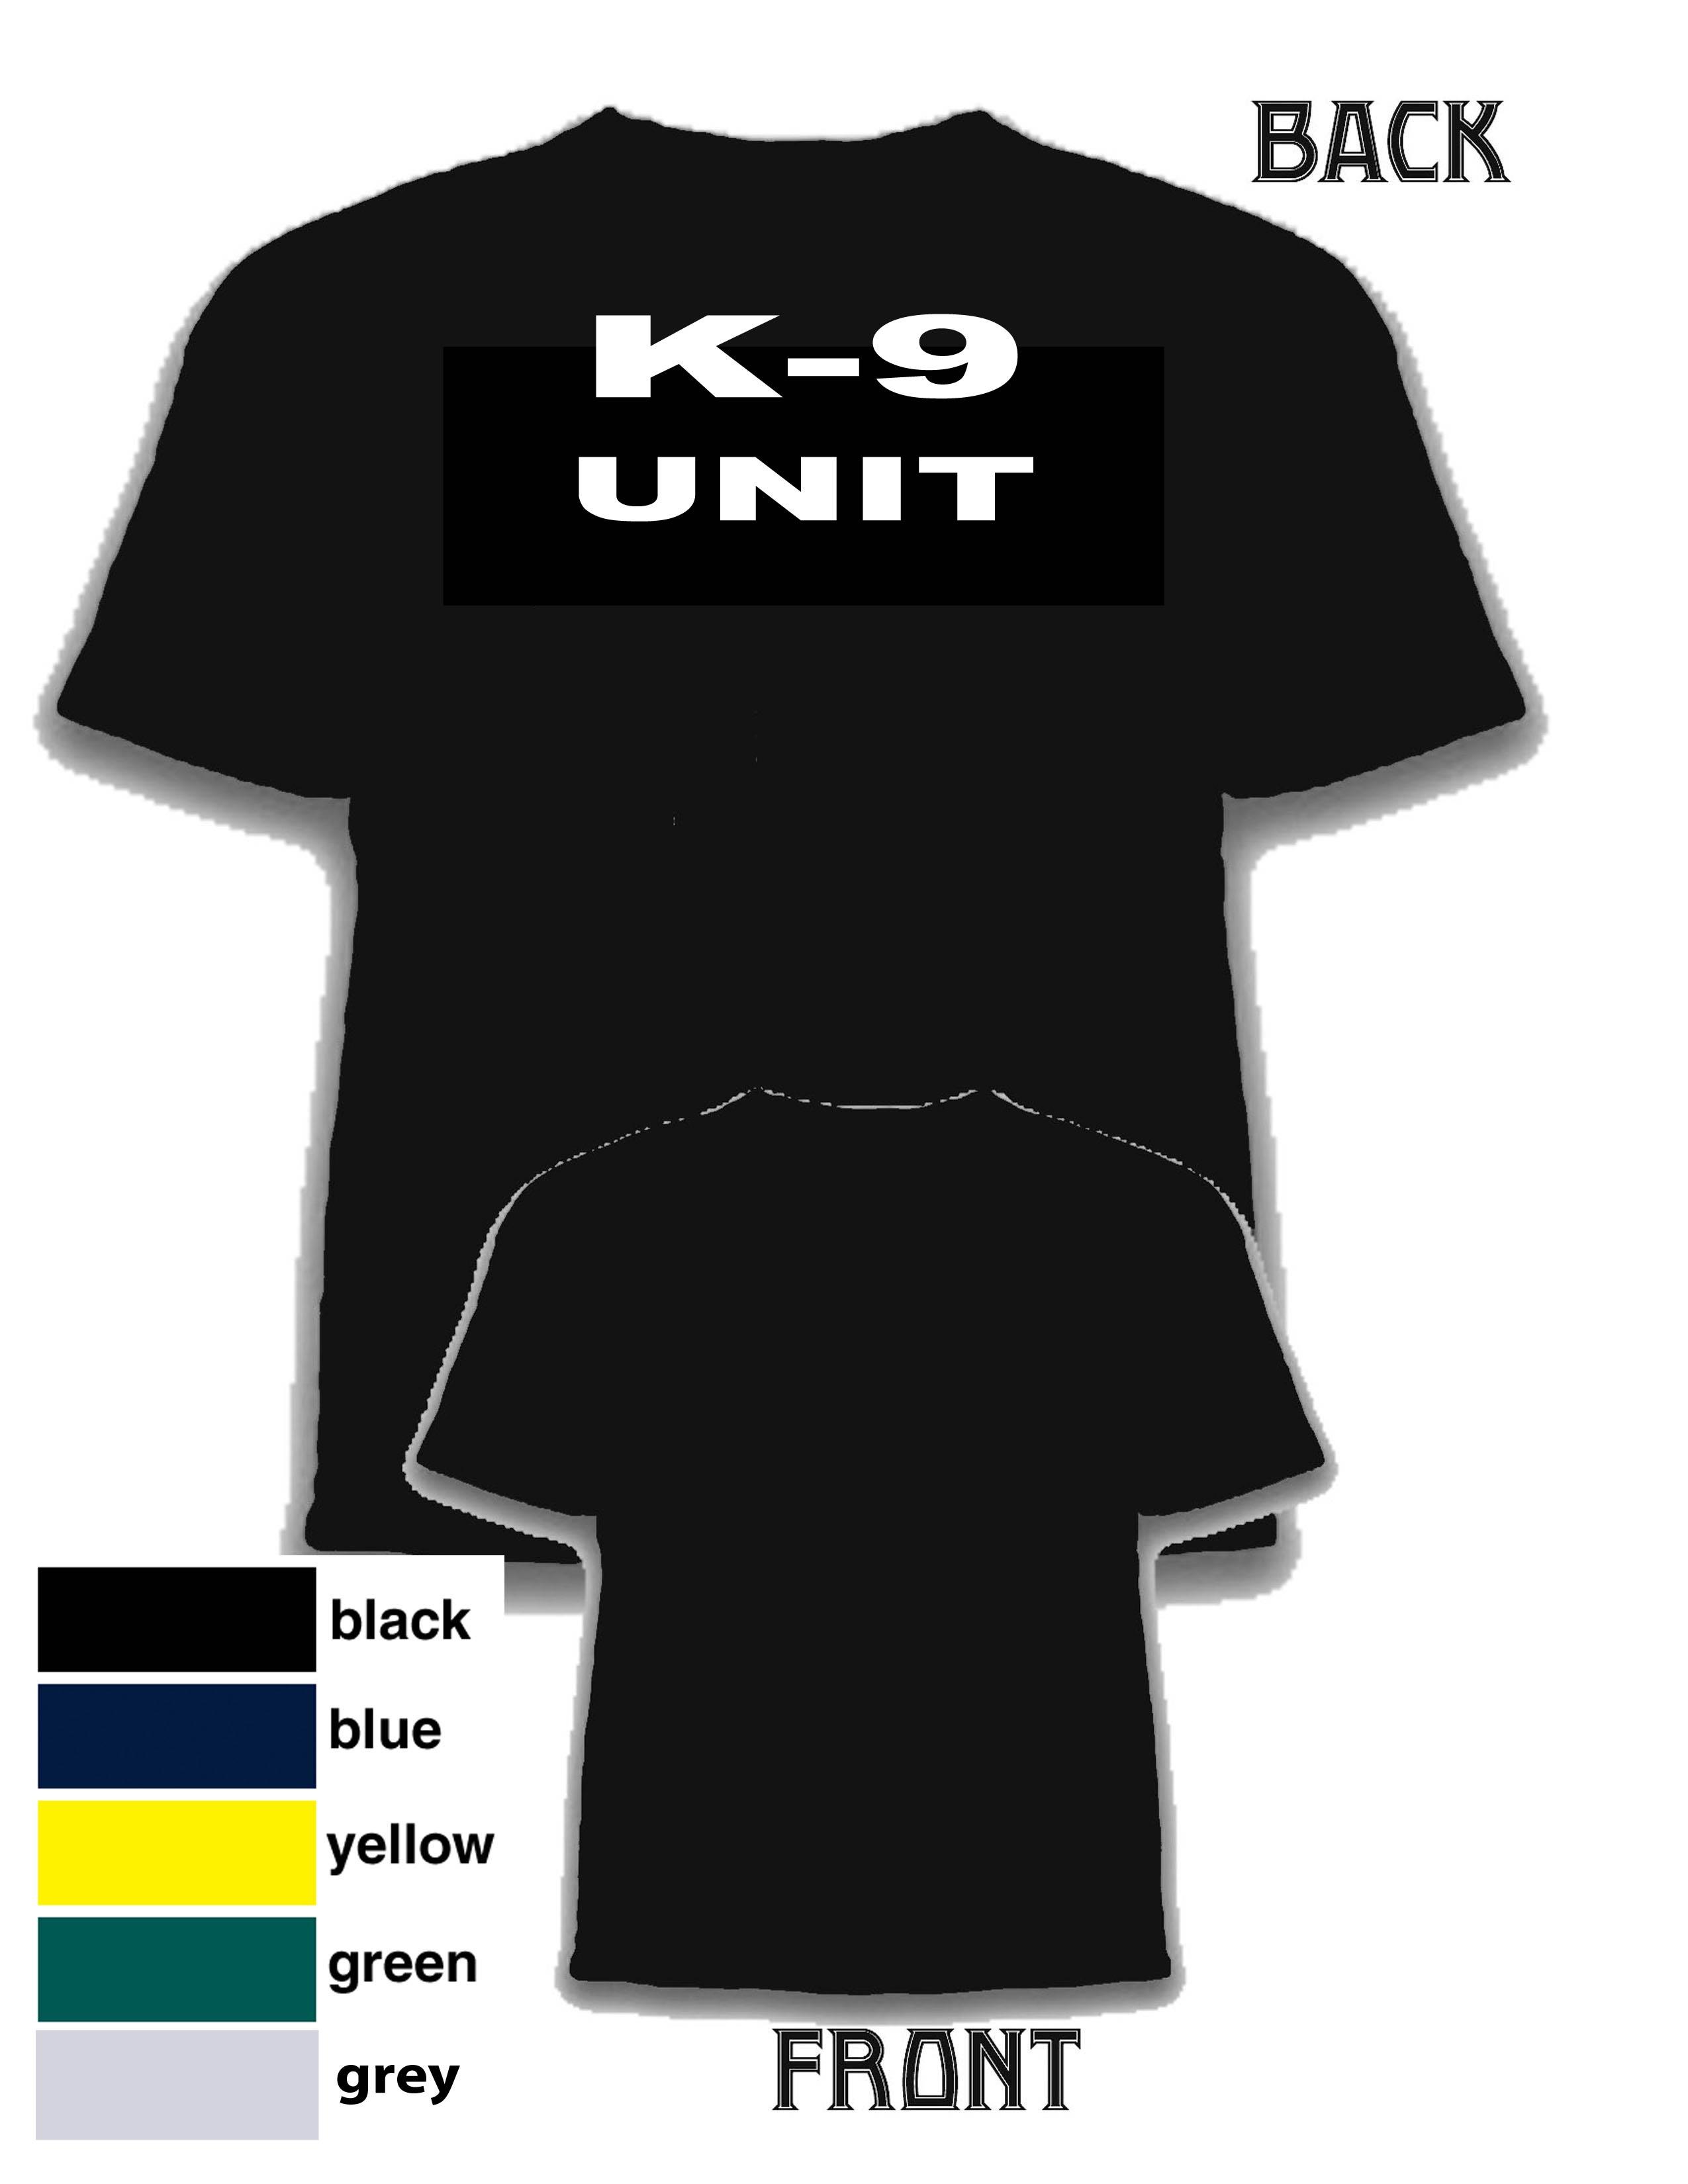 K9 unit shirt for On site t shirt printing